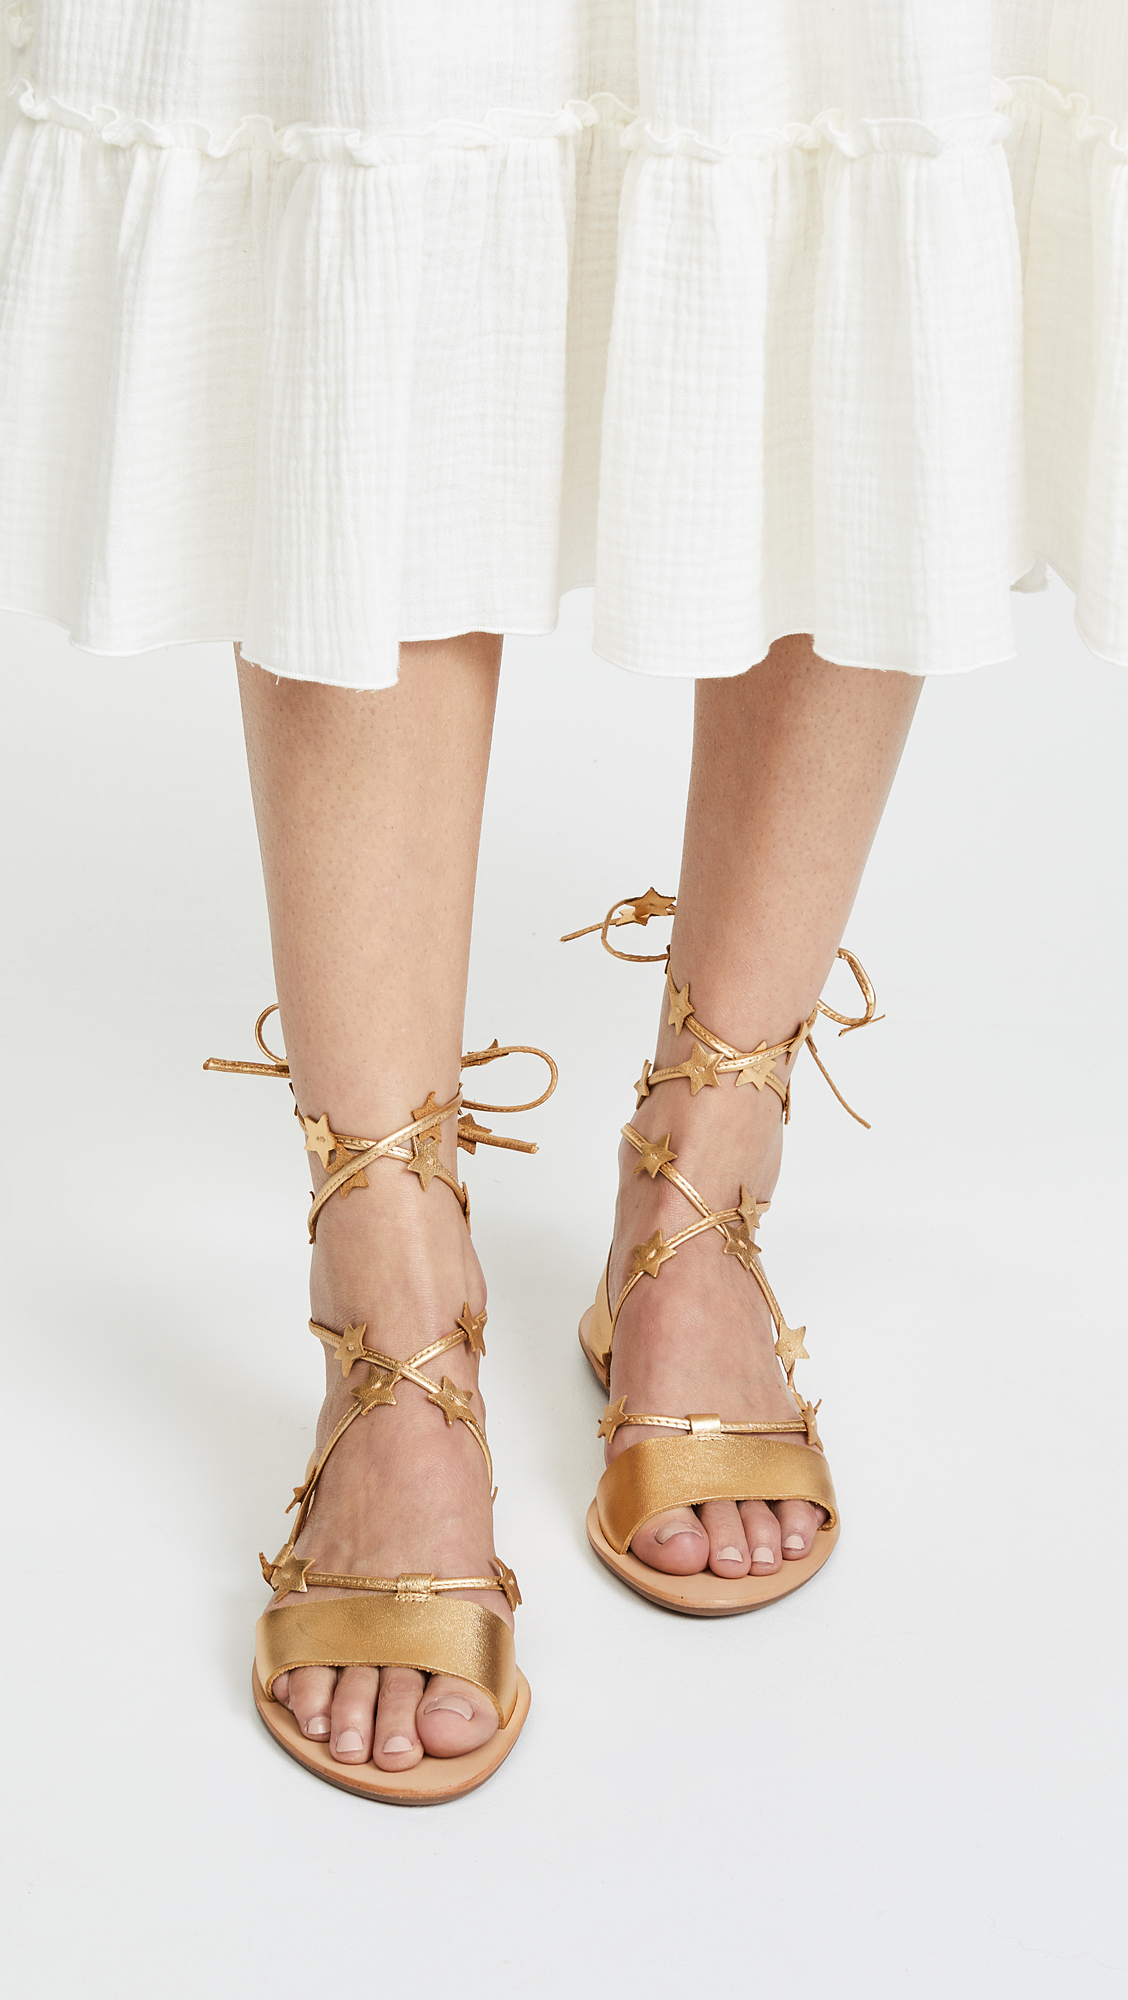 464ac4daf290 Loeffler Randall Starla Flat Sandals